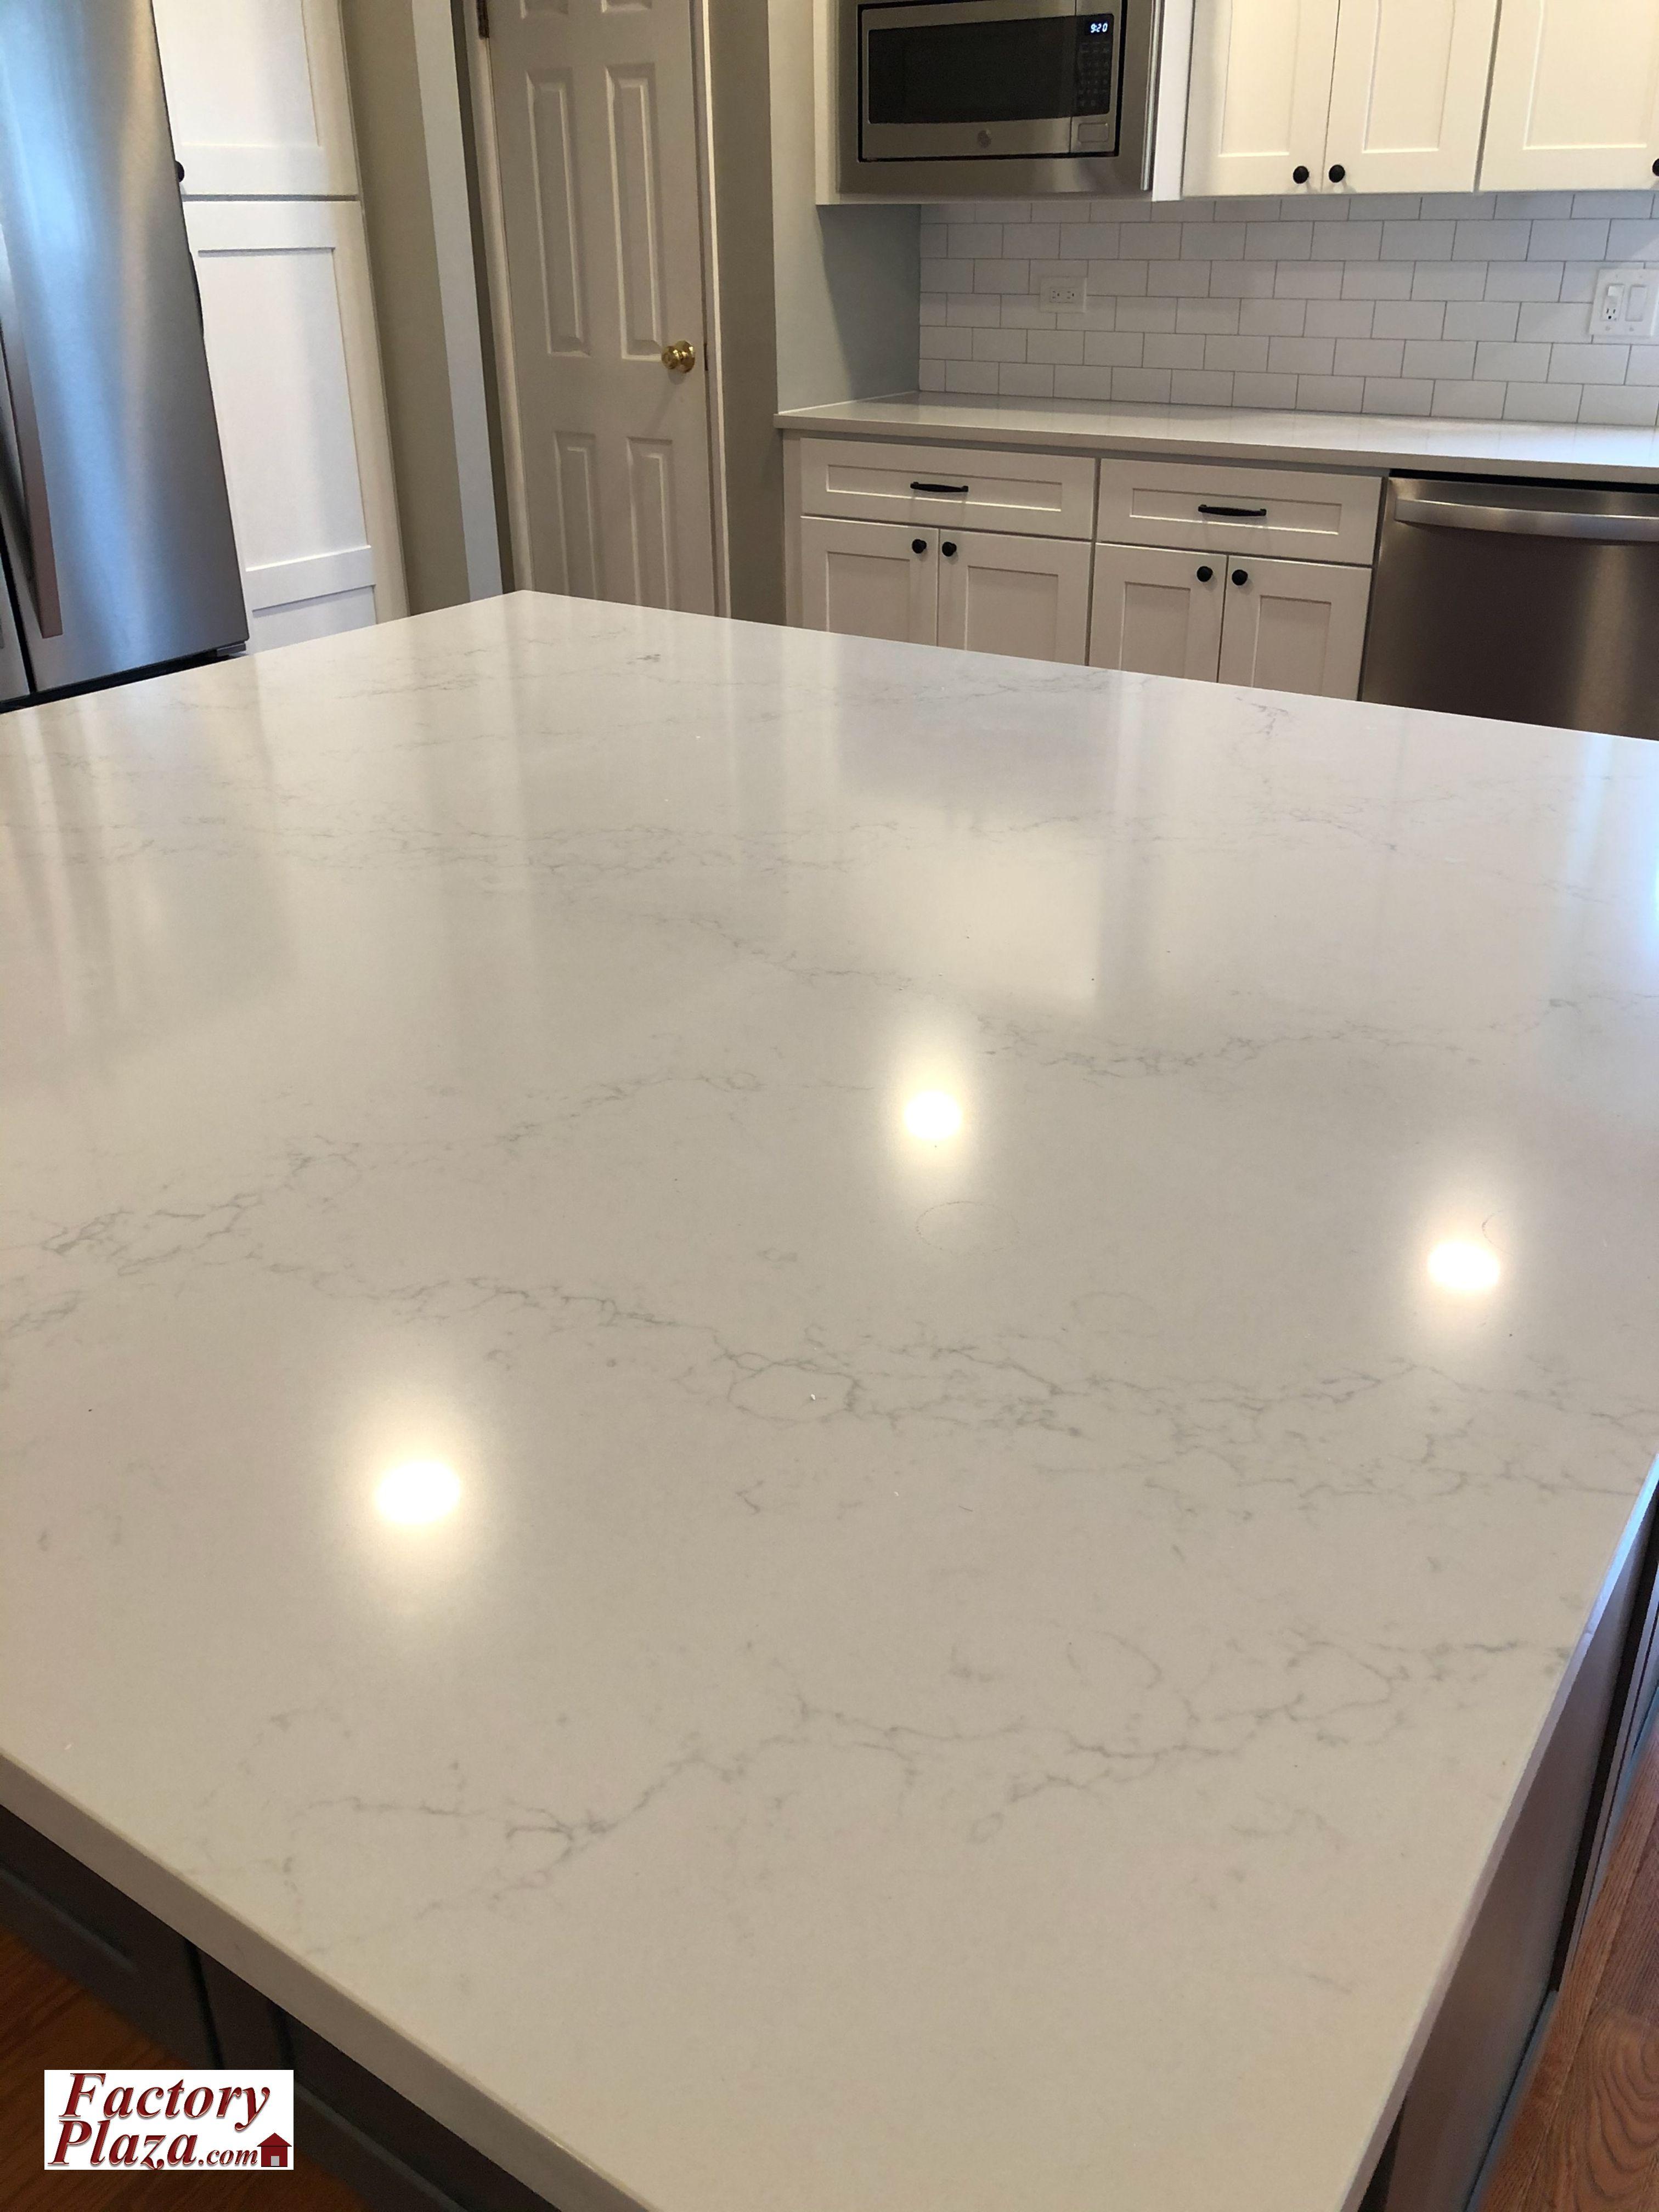 We measure, fabricate and install Granite, Marble, Quartz